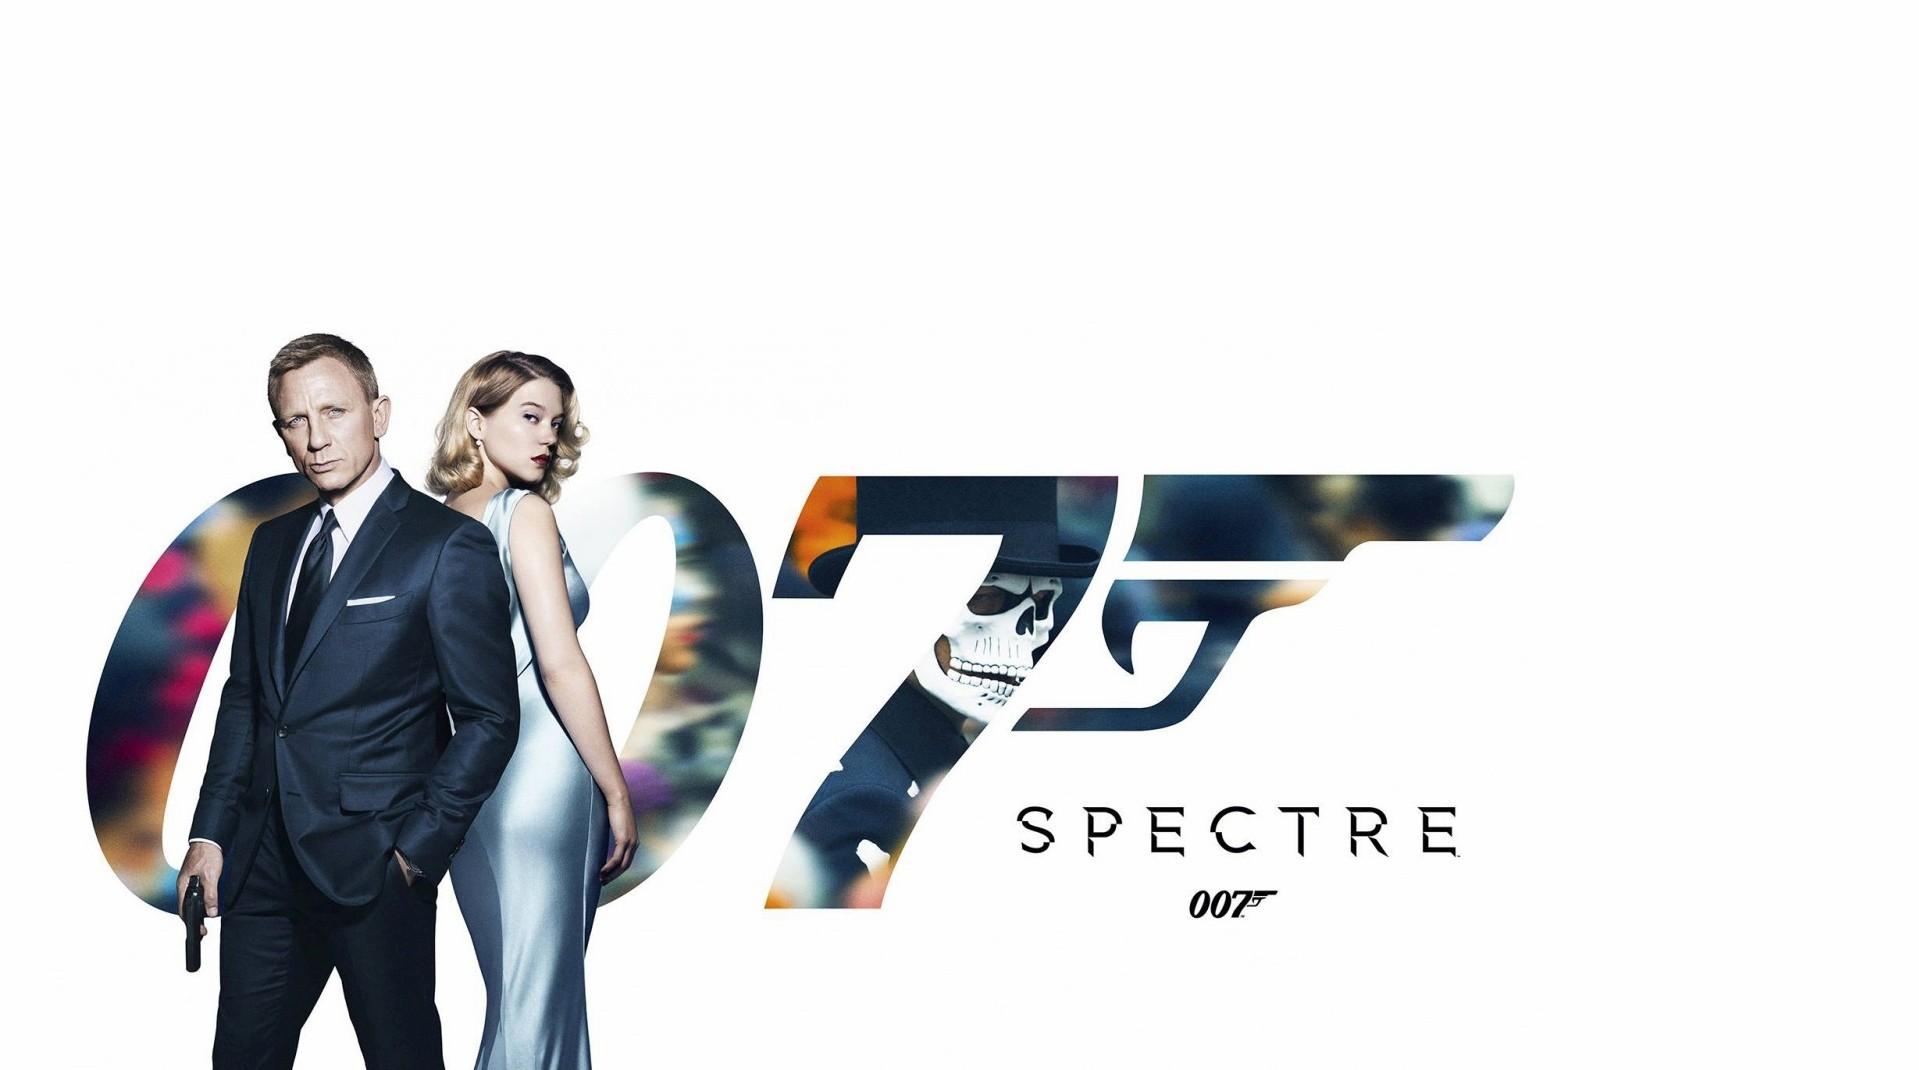 wallpaper : movies, brand, james bond, 007, daniel craig, product